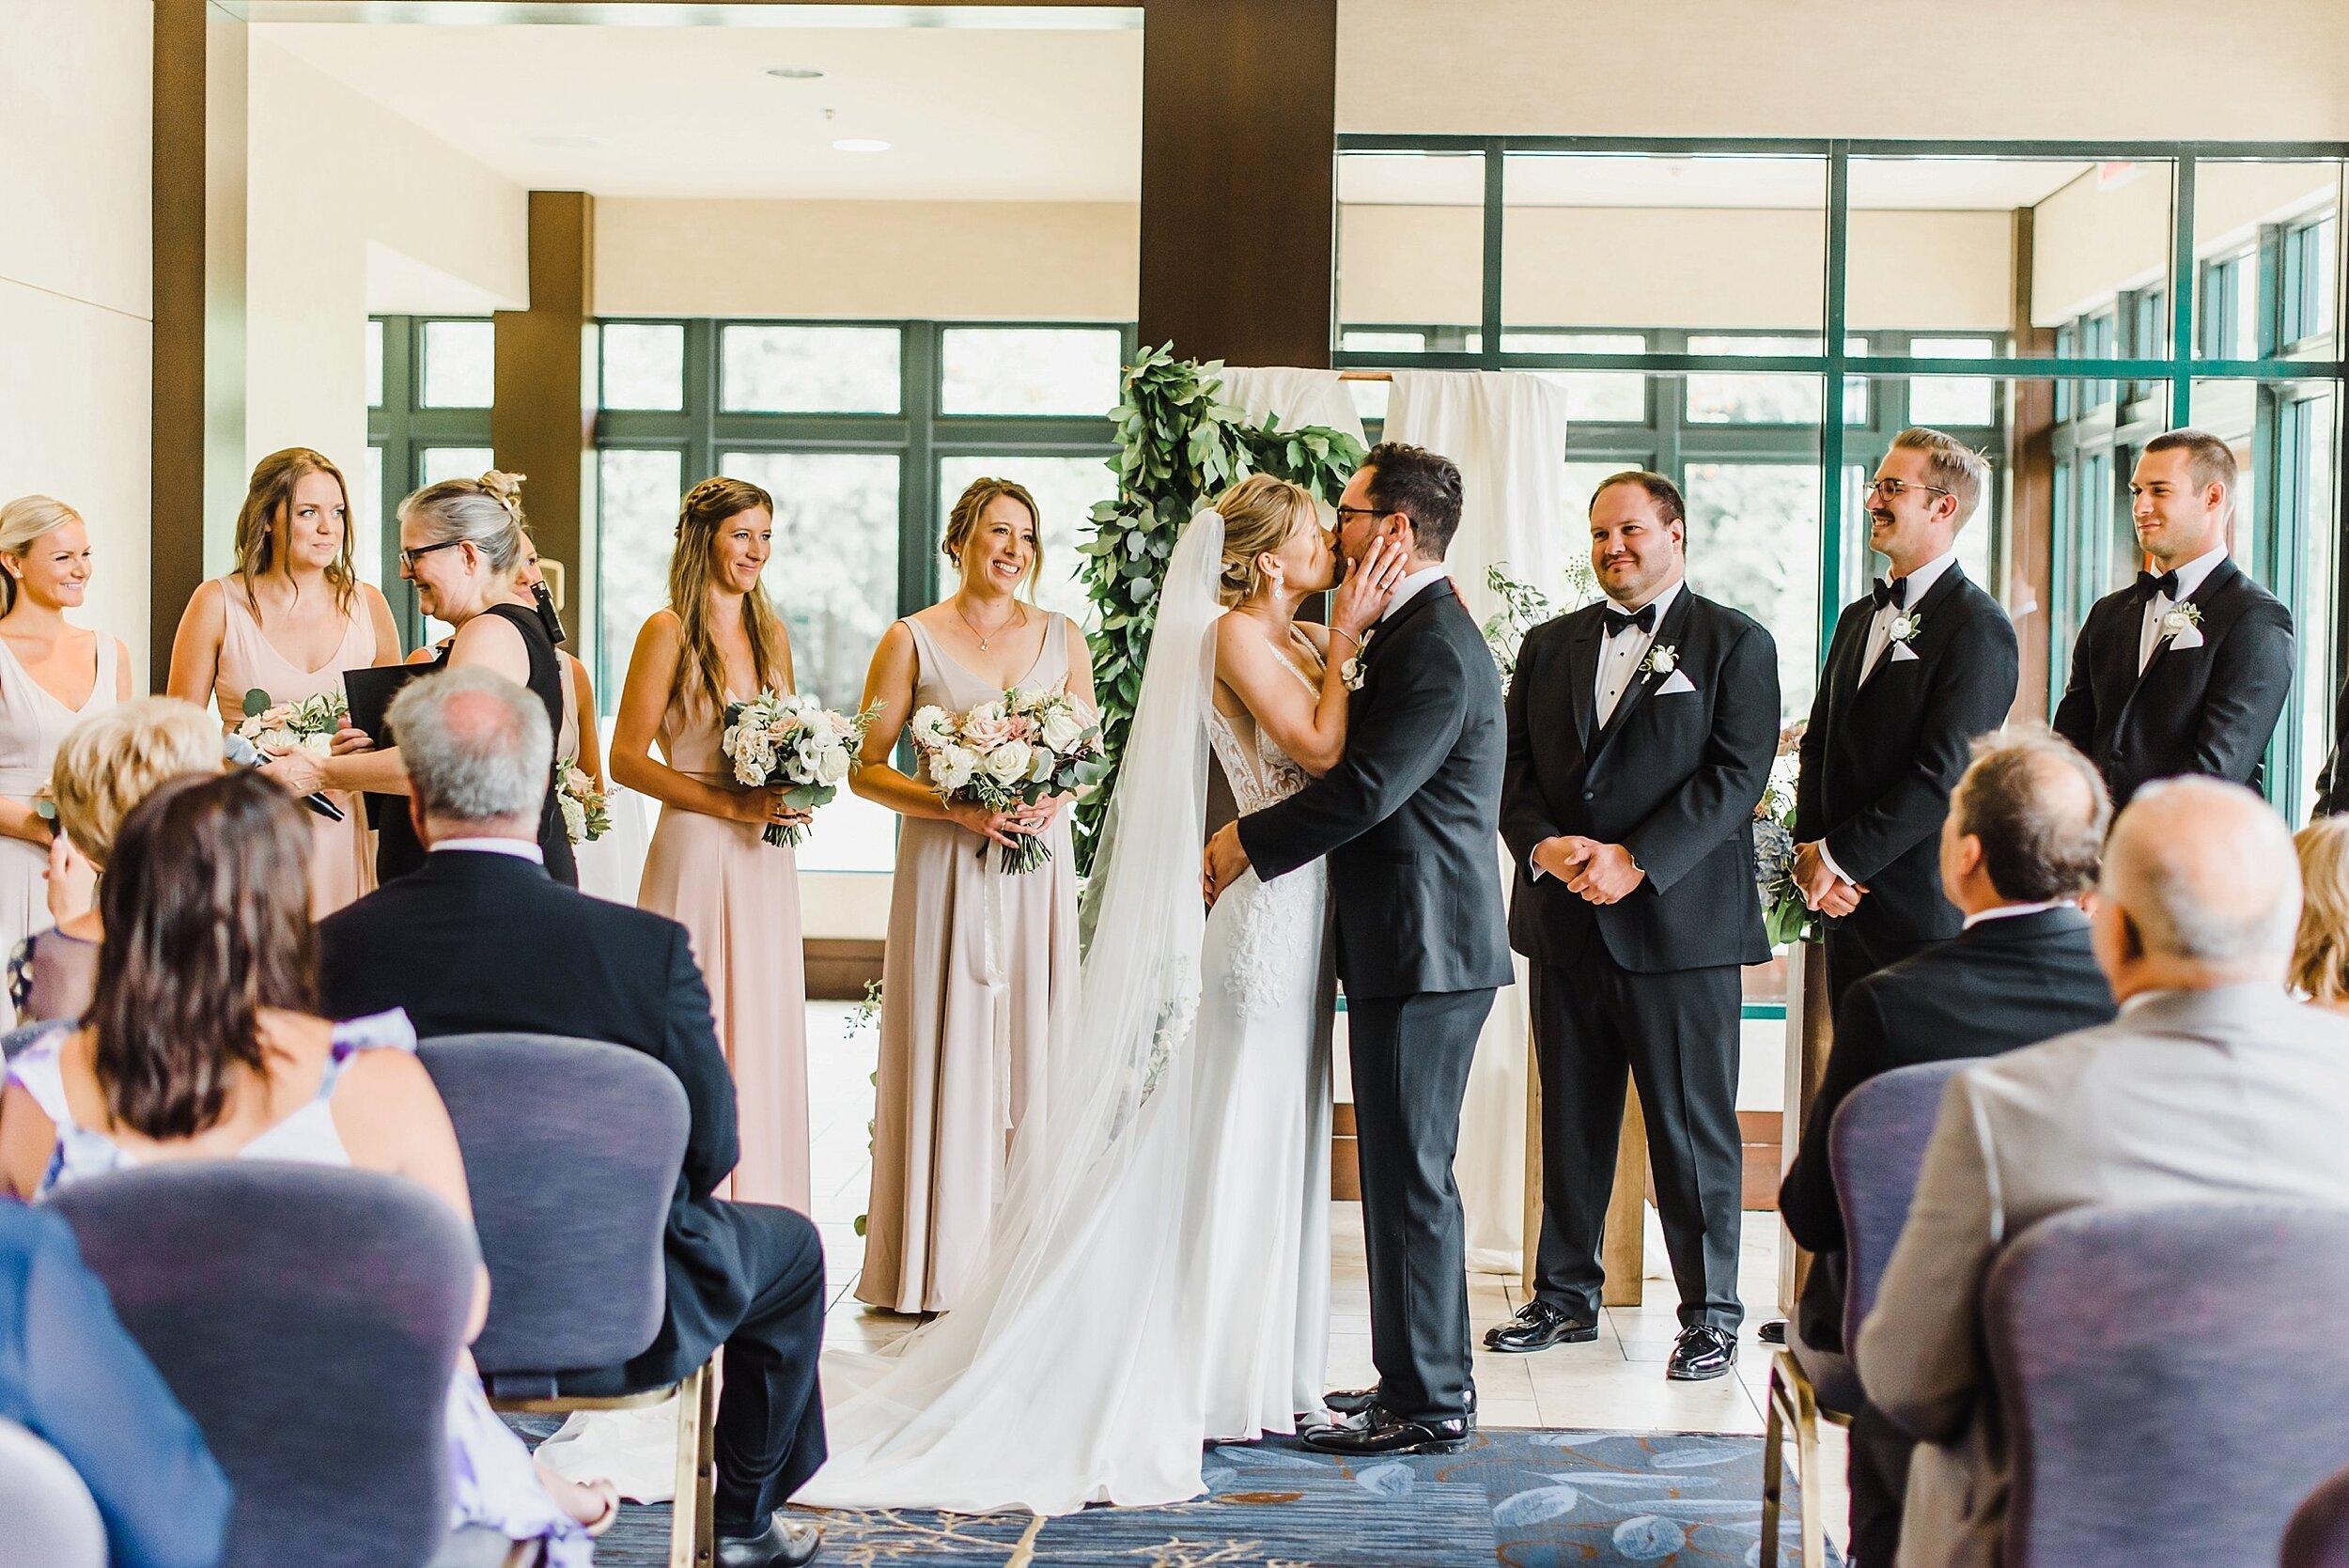 light airy fine art ottawa wedding photographer | Ali and Batoul Photography | Fairmont Le Chateau Montebello37.jpg